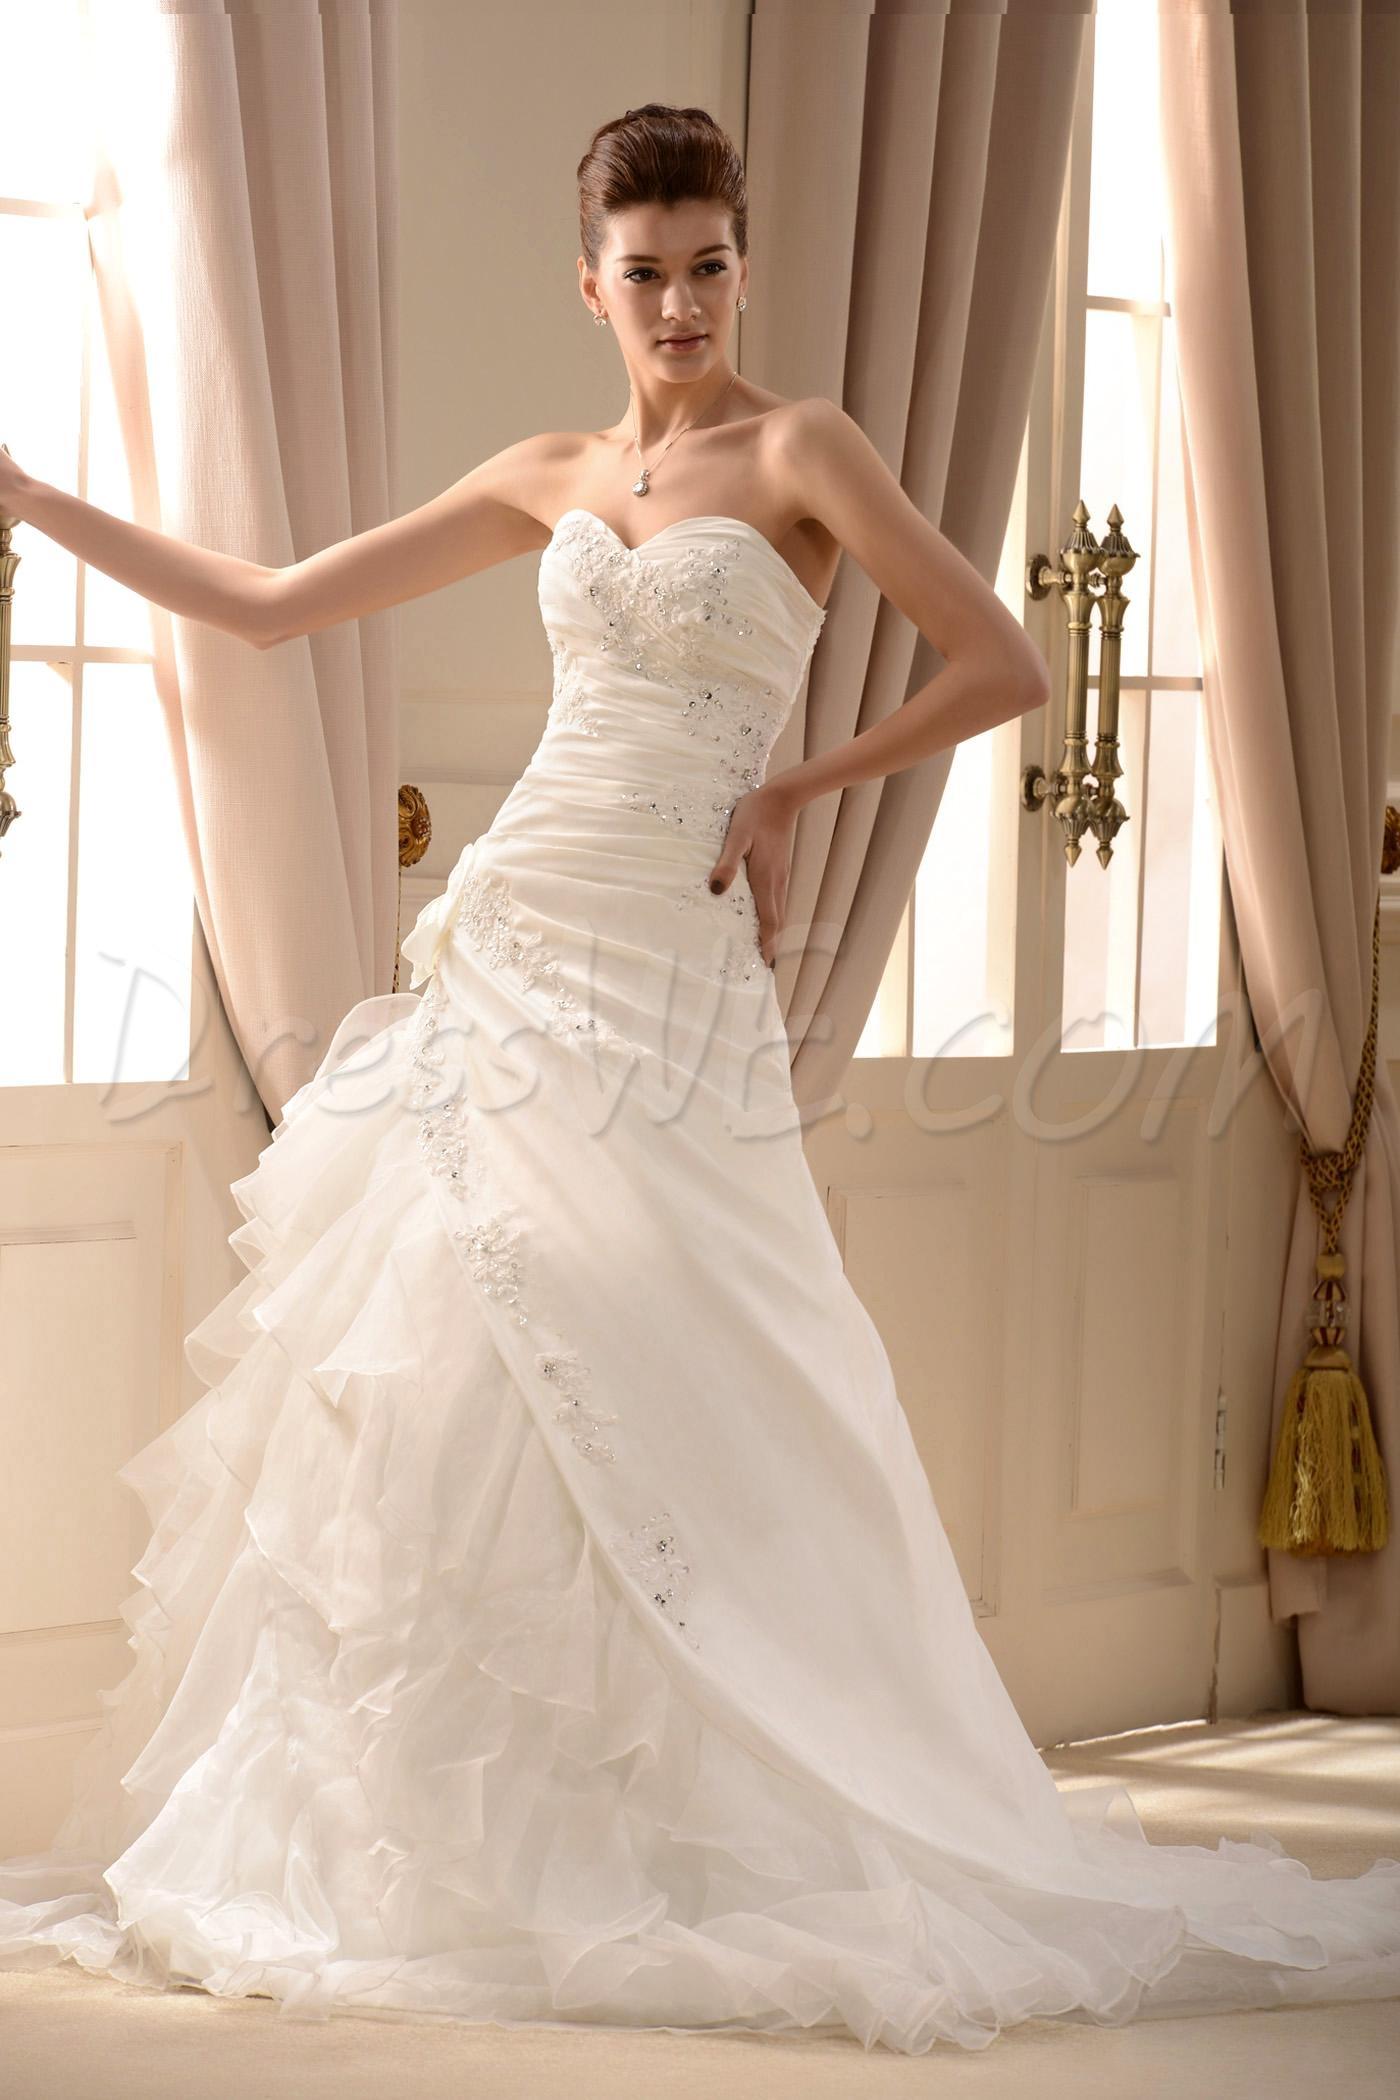 Inspirational Wedding Dresses Tumblr   Wedding